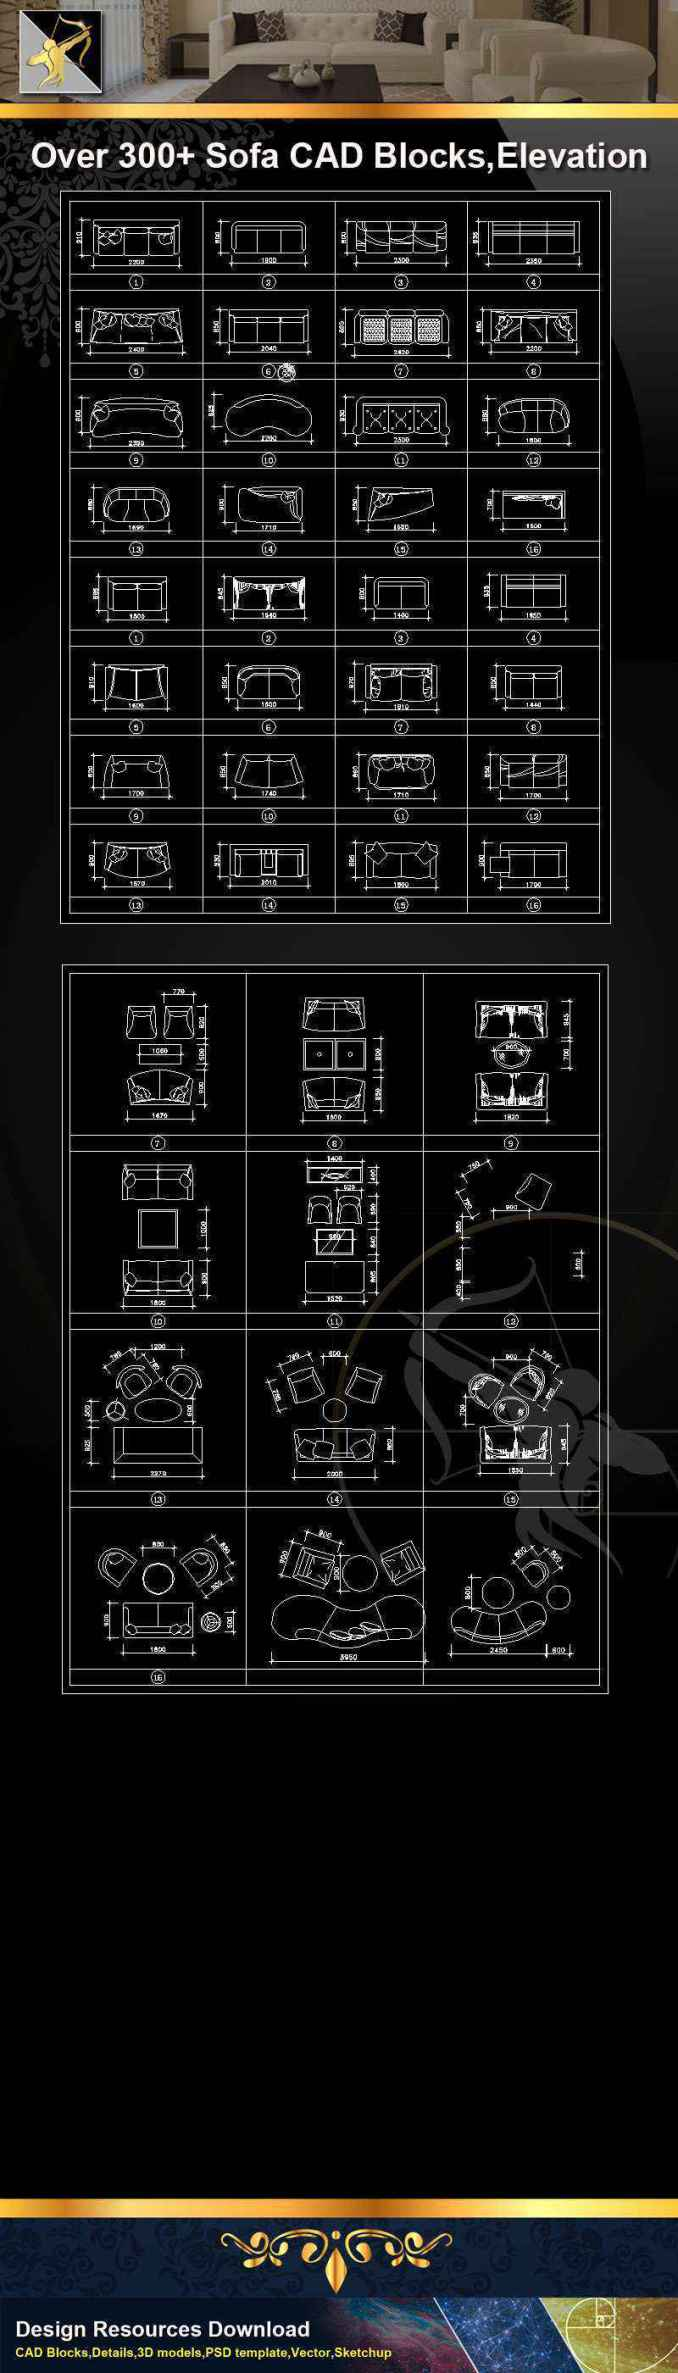 ★【Sofa CAD Blocks】@Autocad Blocks,Drawings,CAD Details,Elevation